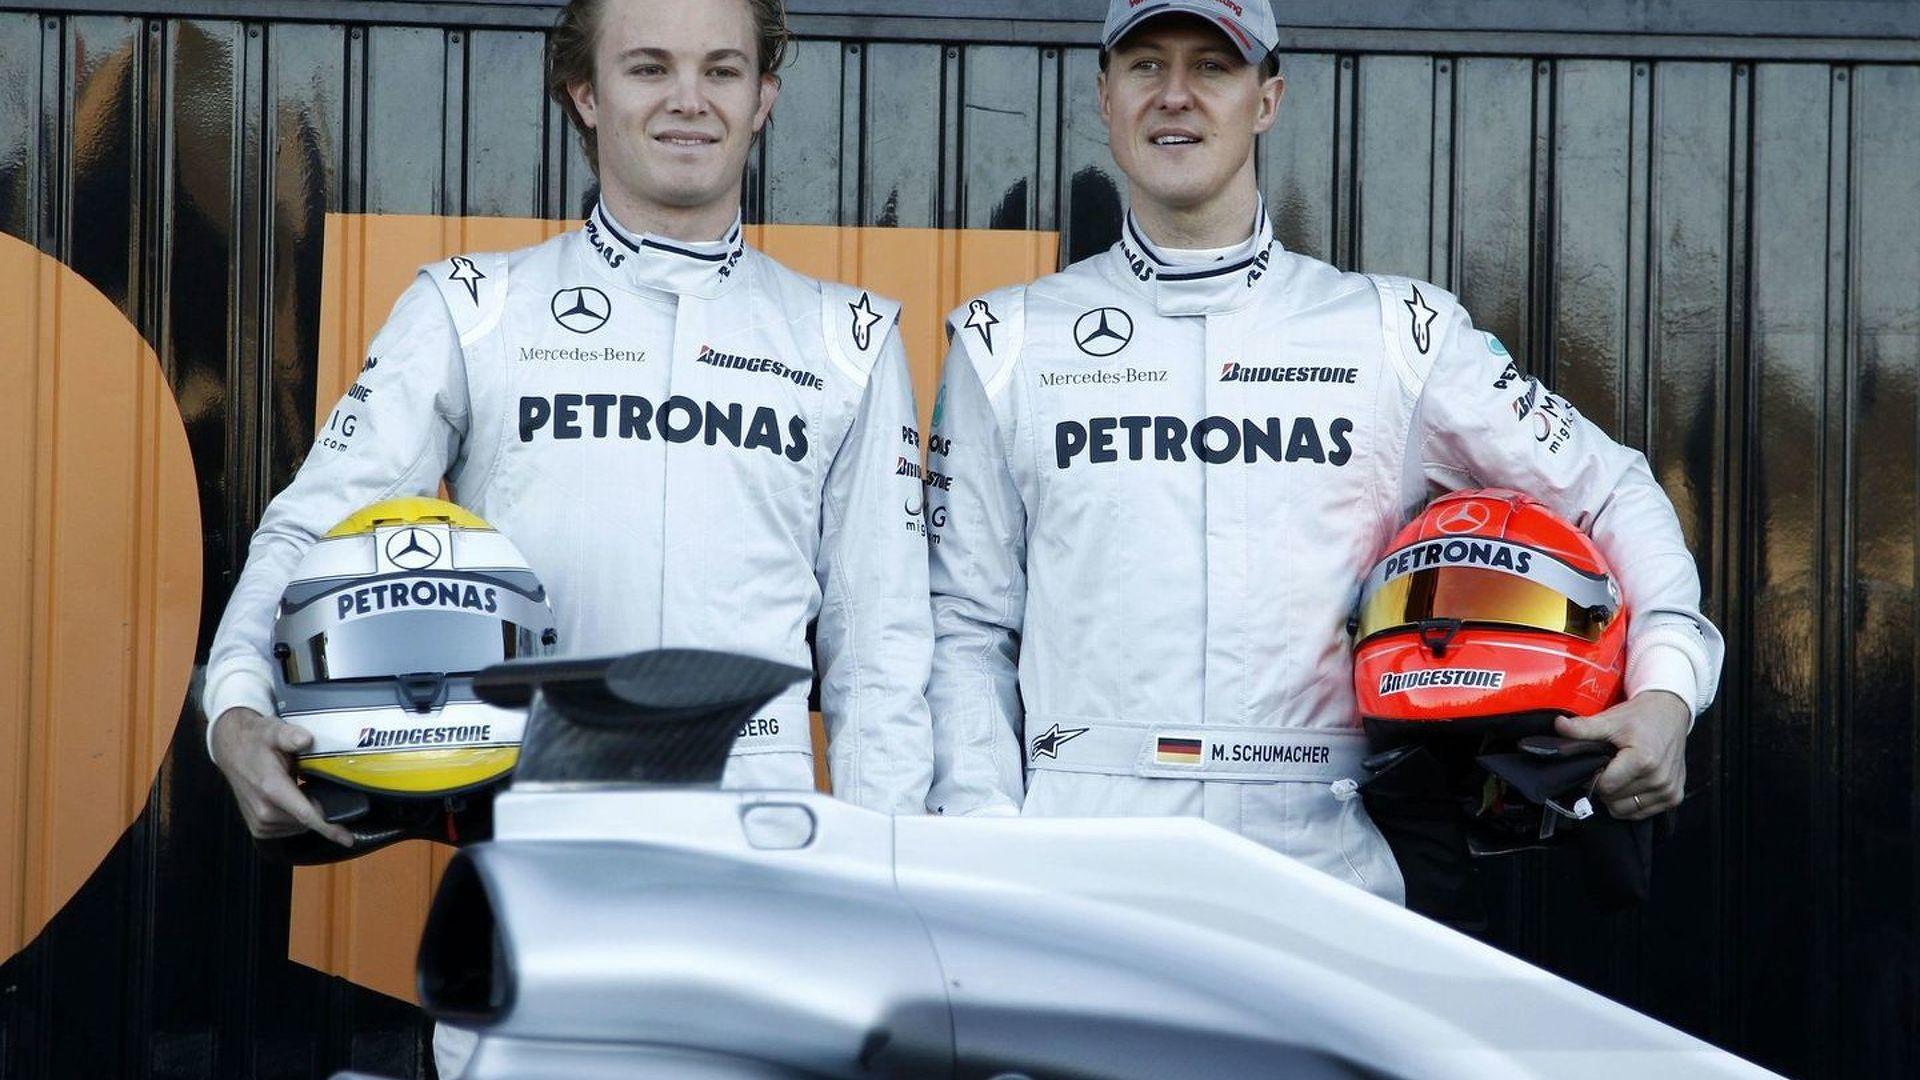 Mercedes hopes to keep same drivers in 2011